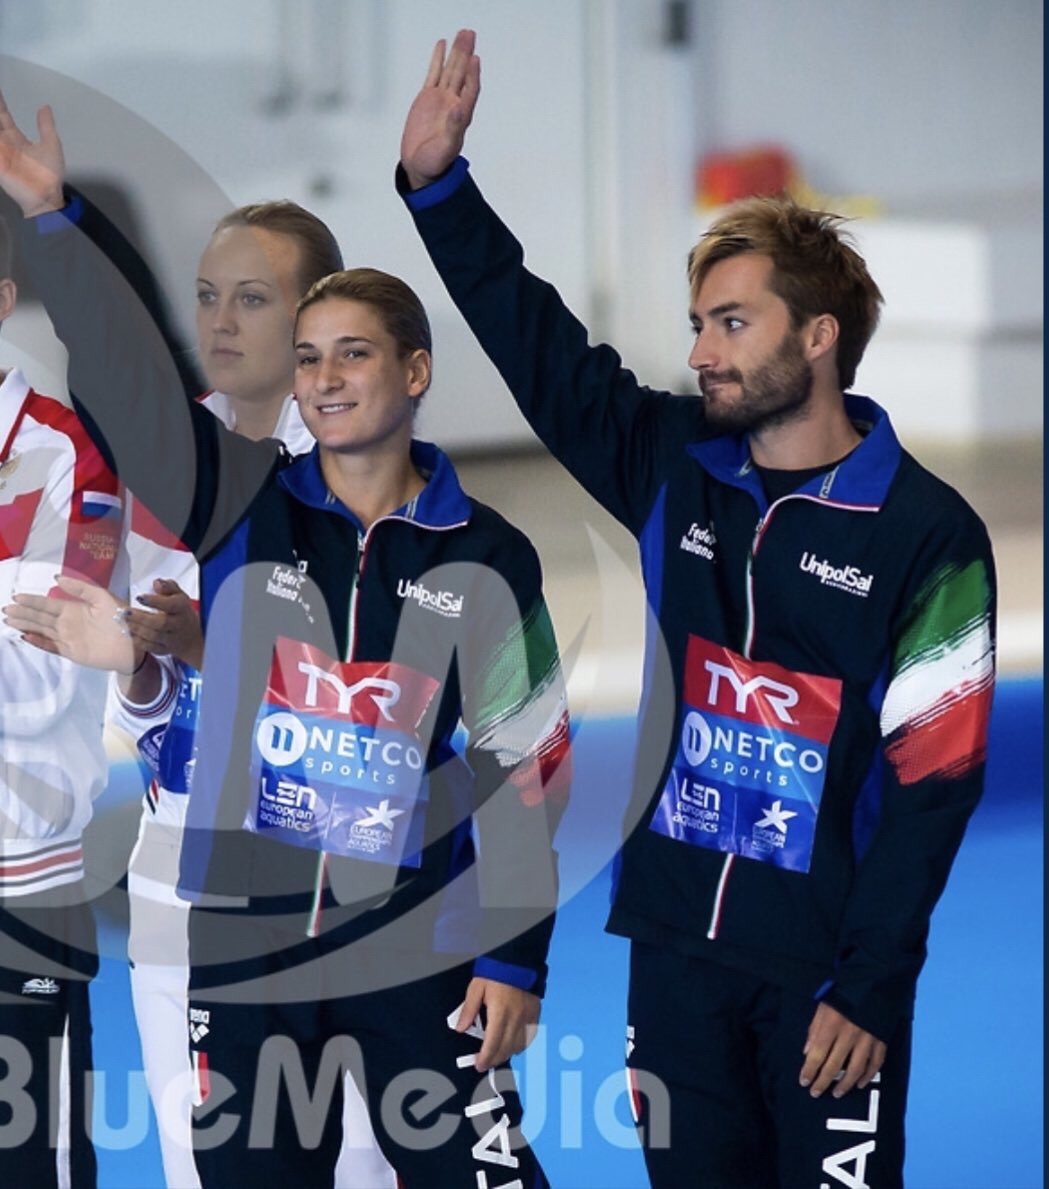 I Video di TuffBlog: speciale European Championships, quarta parte!